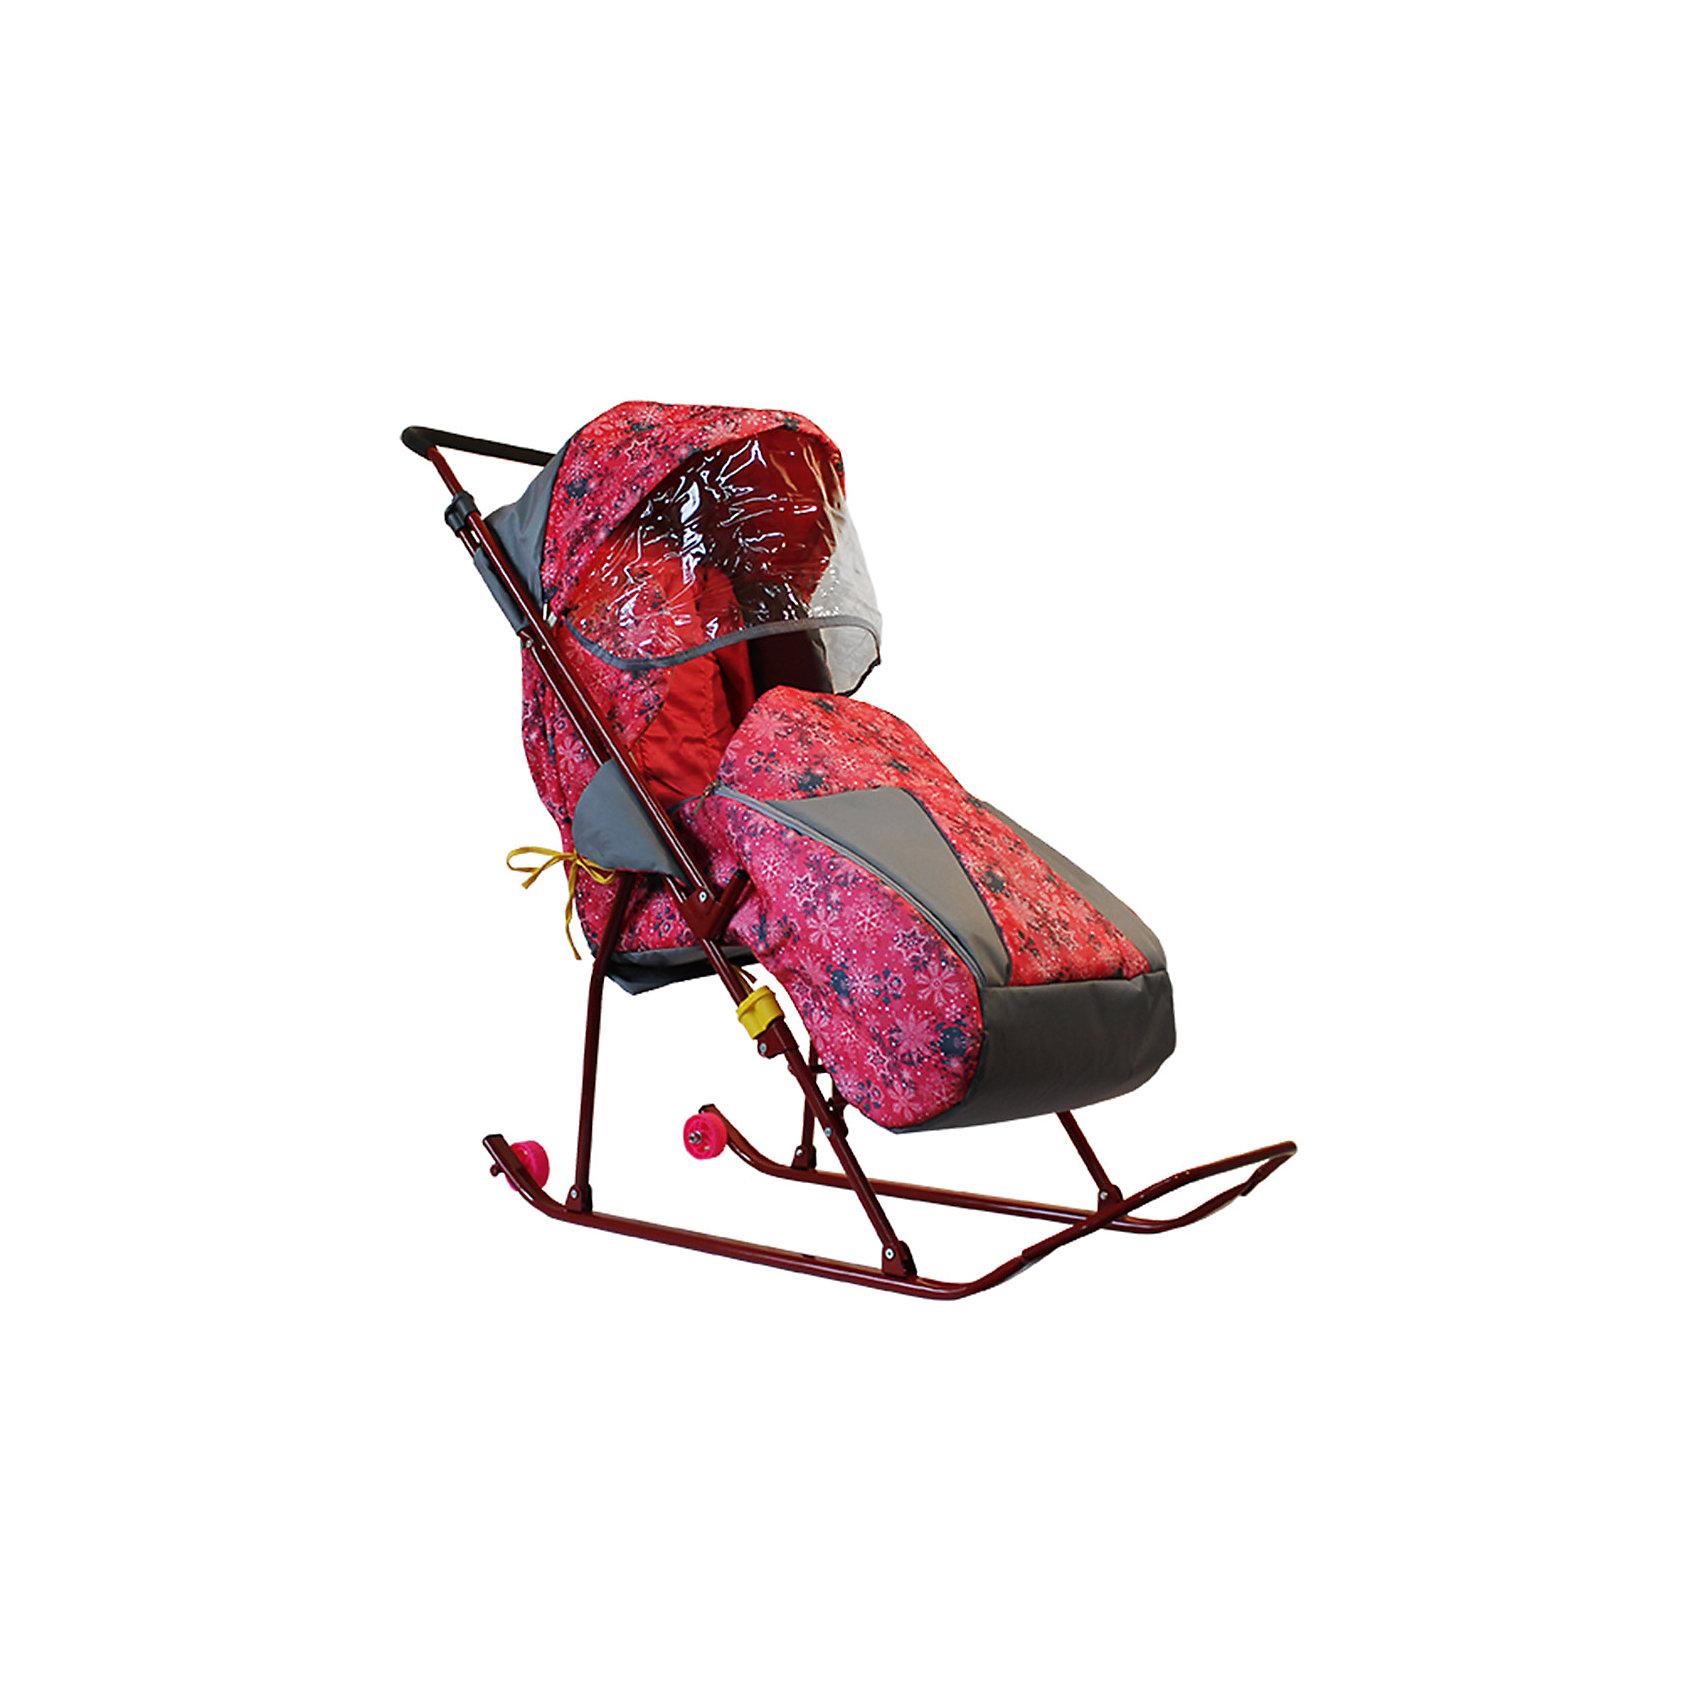 Санки-коляска Снежинка премиум, Galaxy, снежинки/розовый